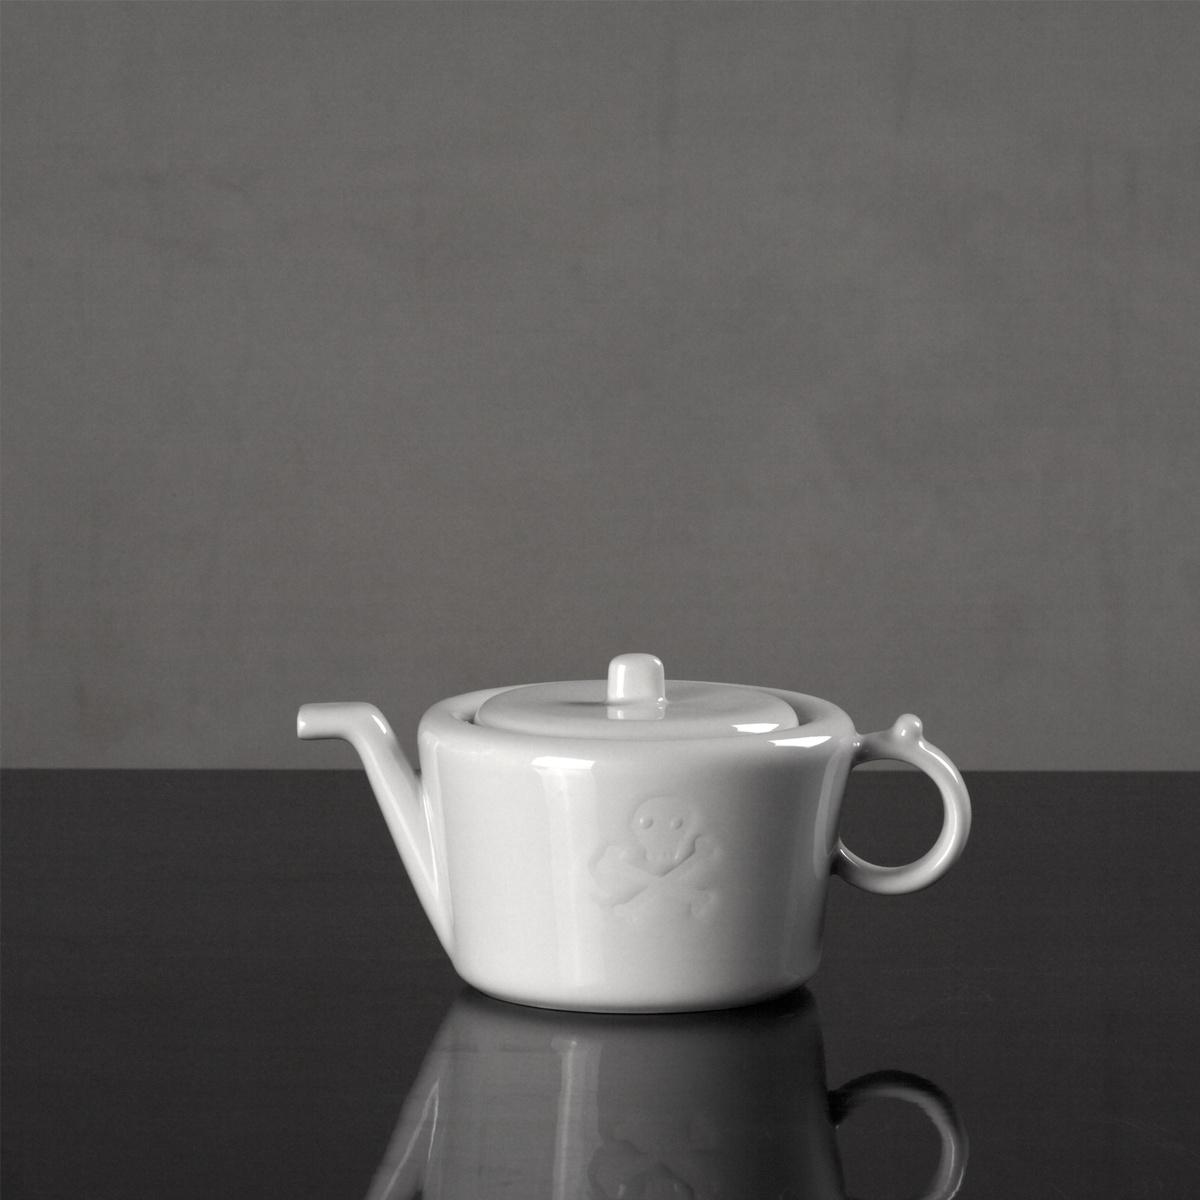 Studio Pirsc Porcelain konvice mocca Maryša 700 ml, bílá